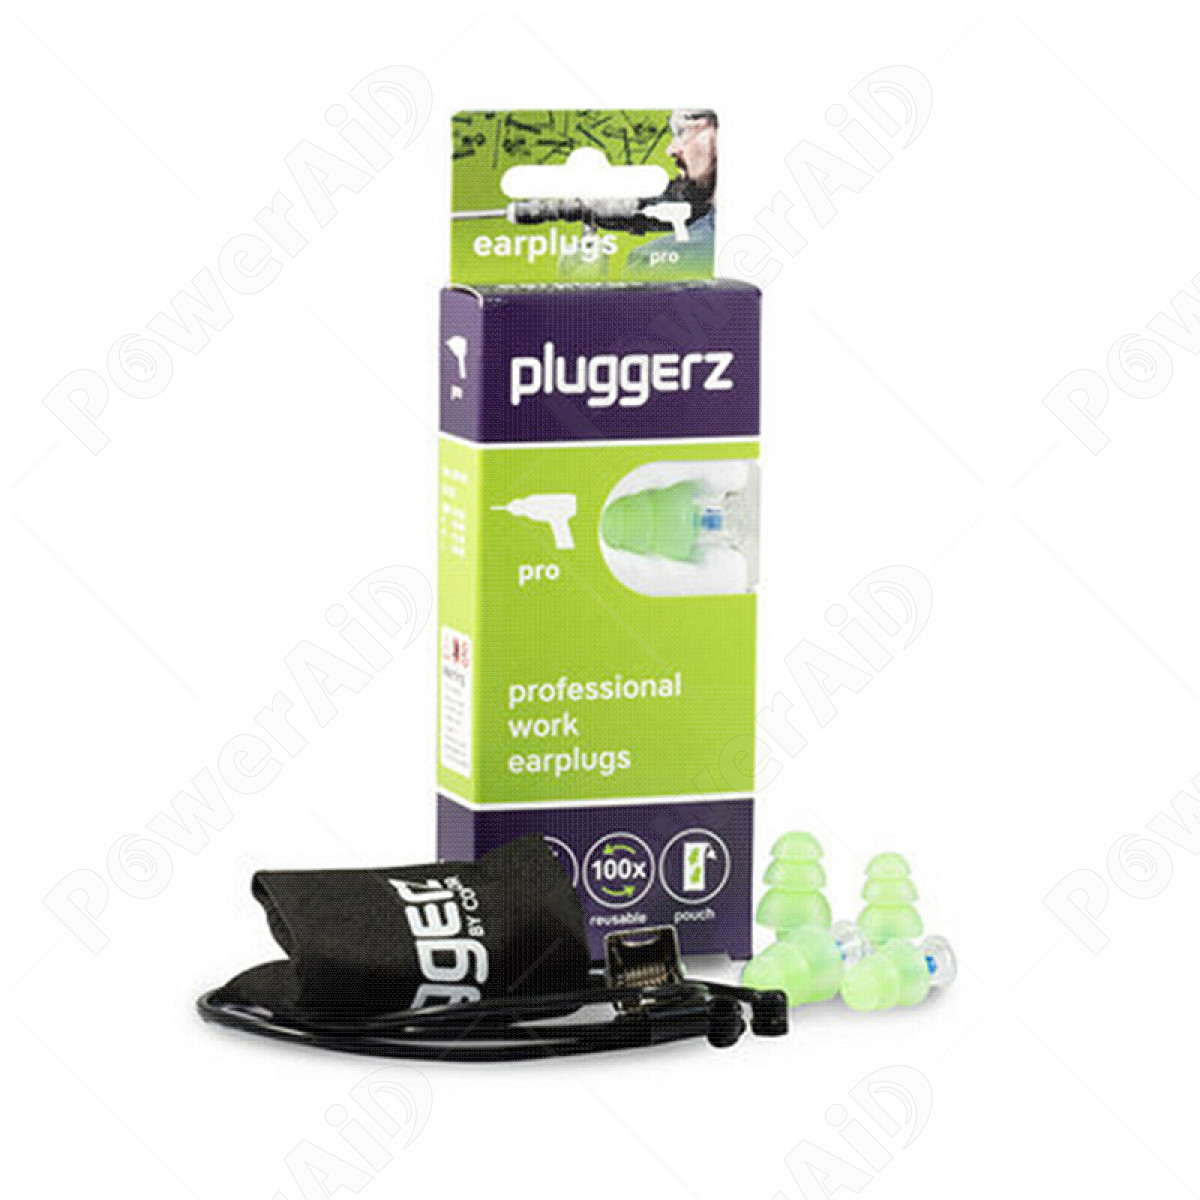 Pluggerz – Pro Uni-Fit